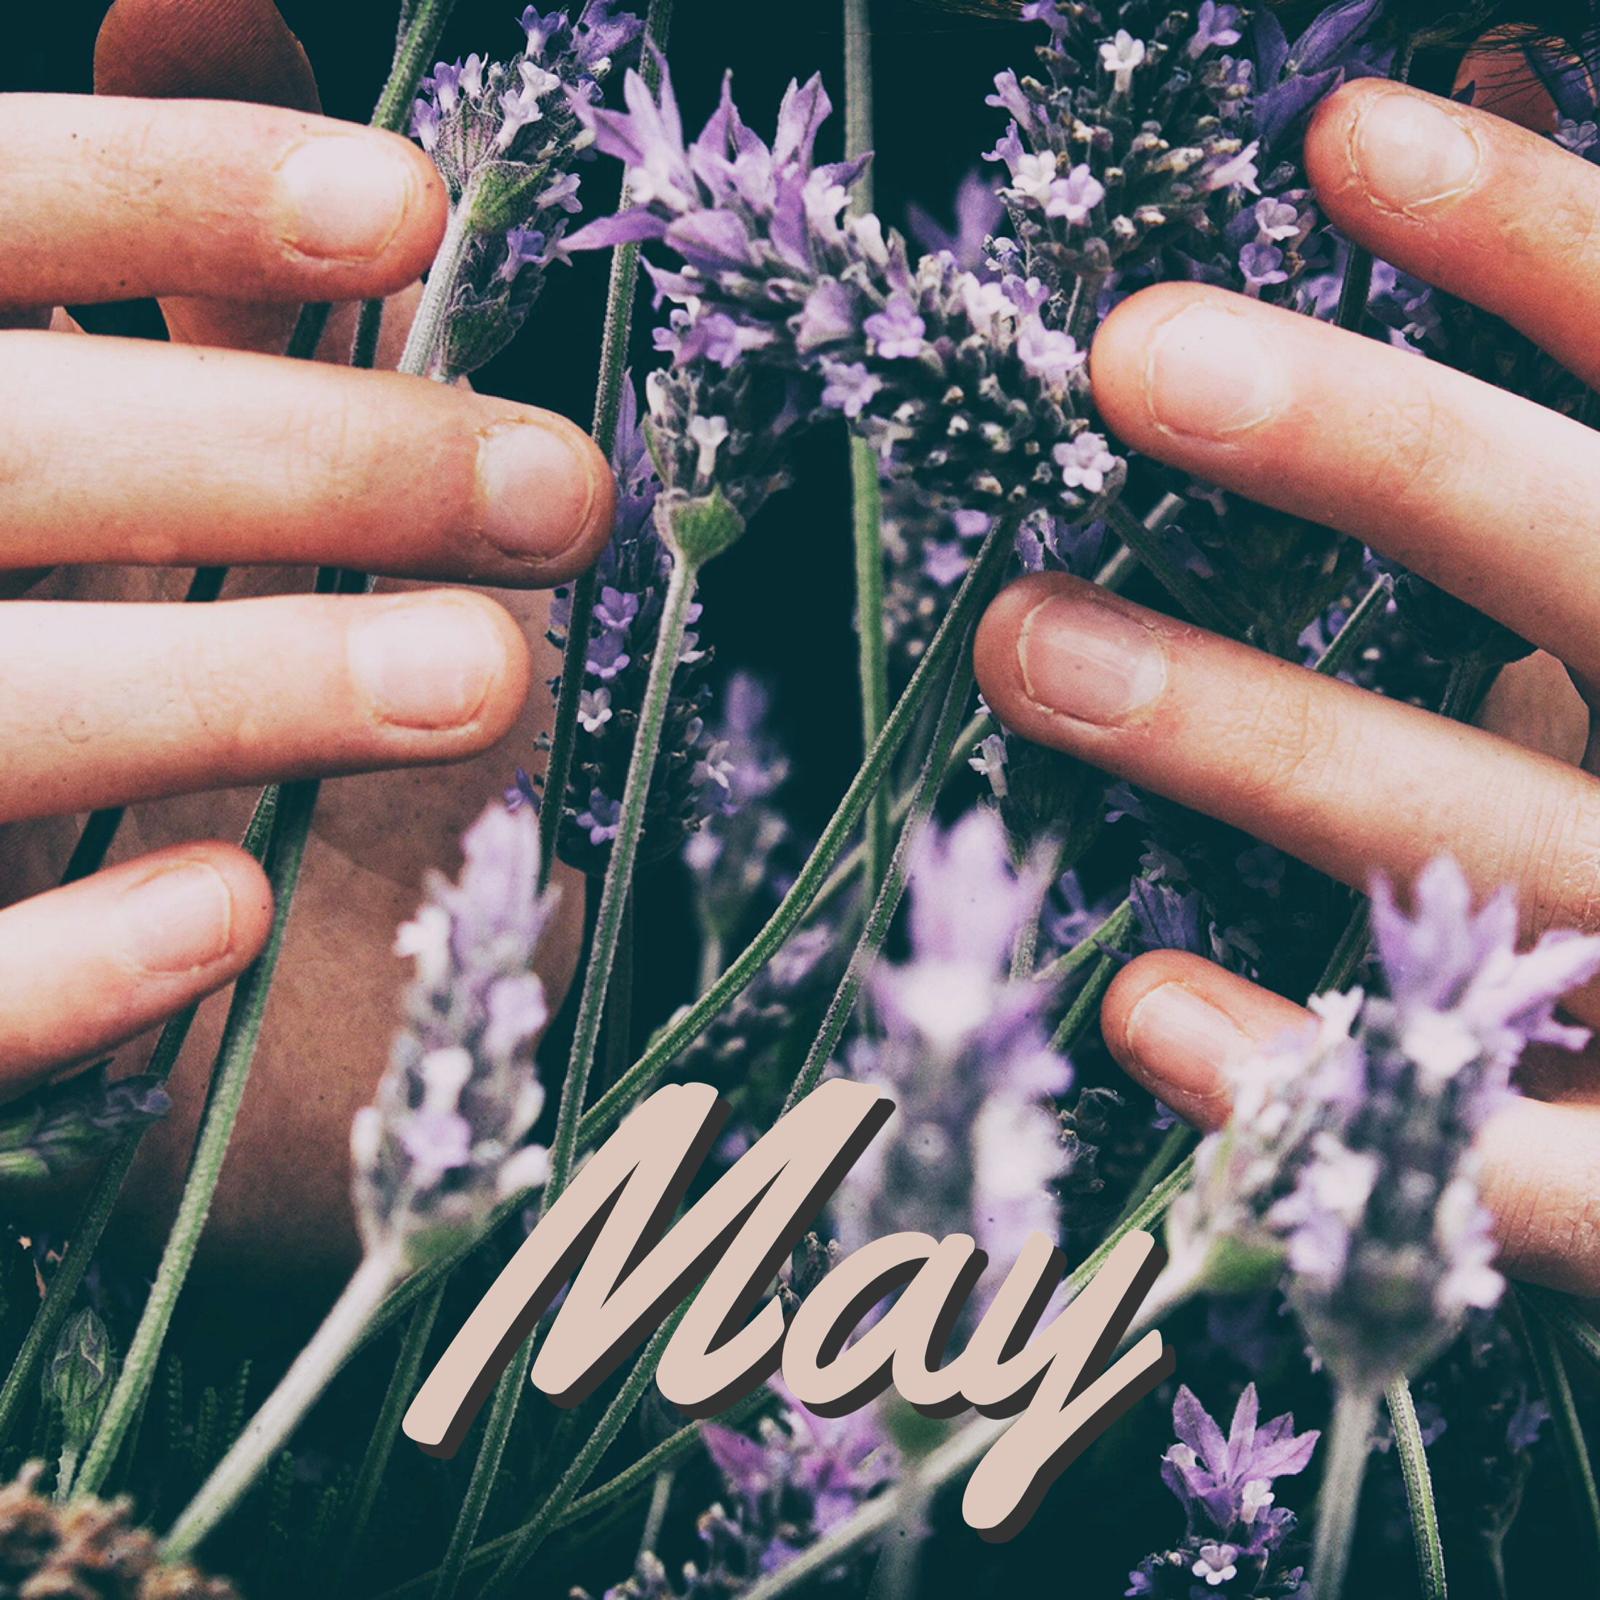 May 2020 meeting: Aromatherapy